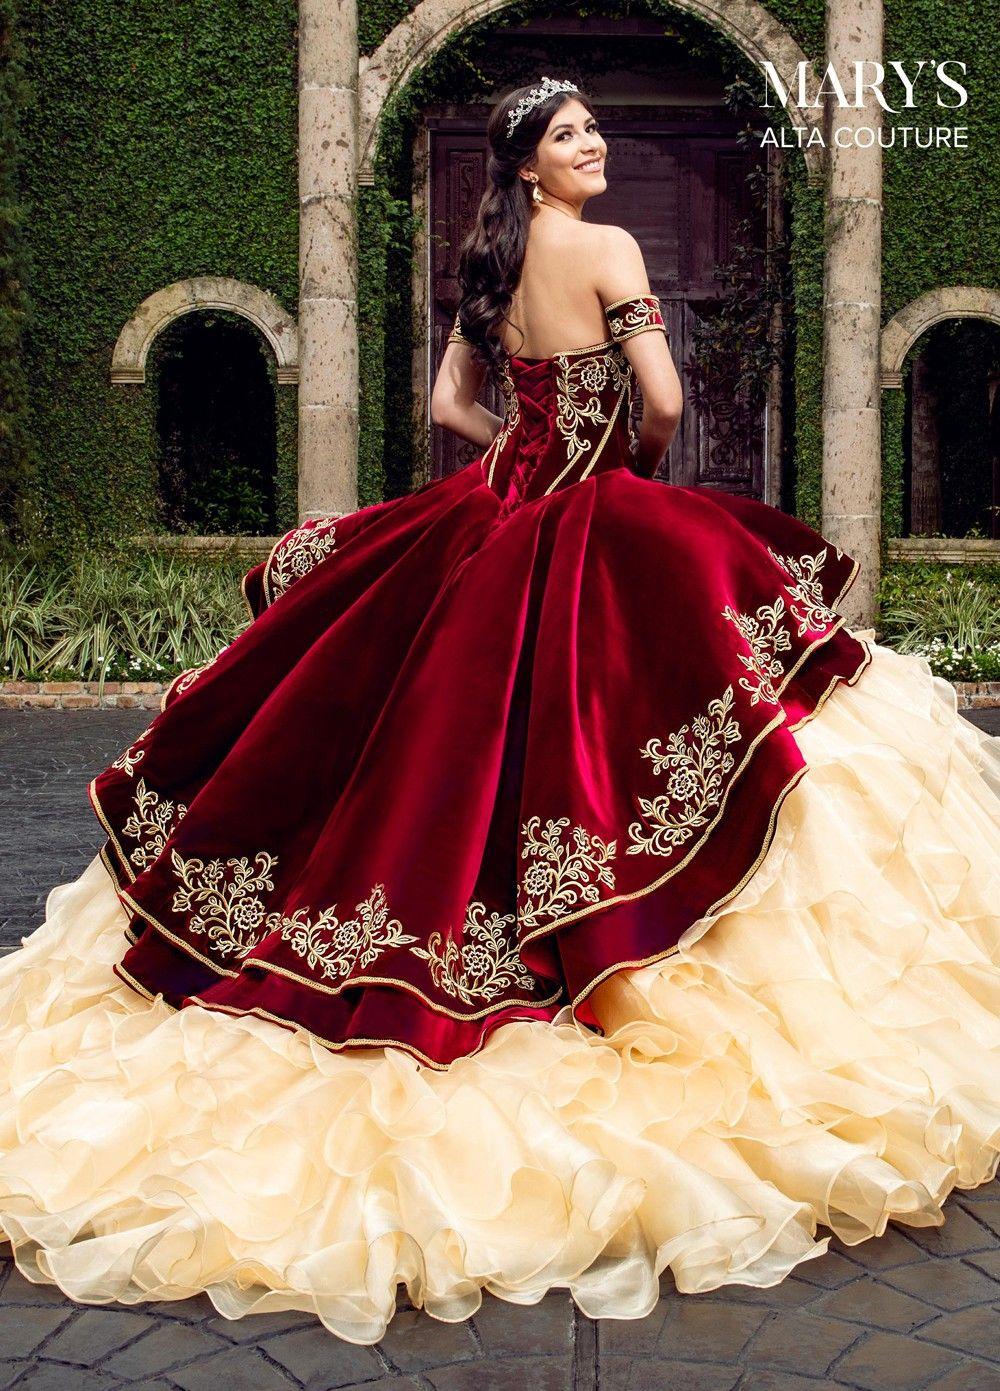 Marys Bridal Mq3037 Ruffle Skirt Quinceanera Gown 15 Dresses Quinceanera Red Wedding Dresses Quincenera Dresses [ 1391 x 1000 Pixel ]